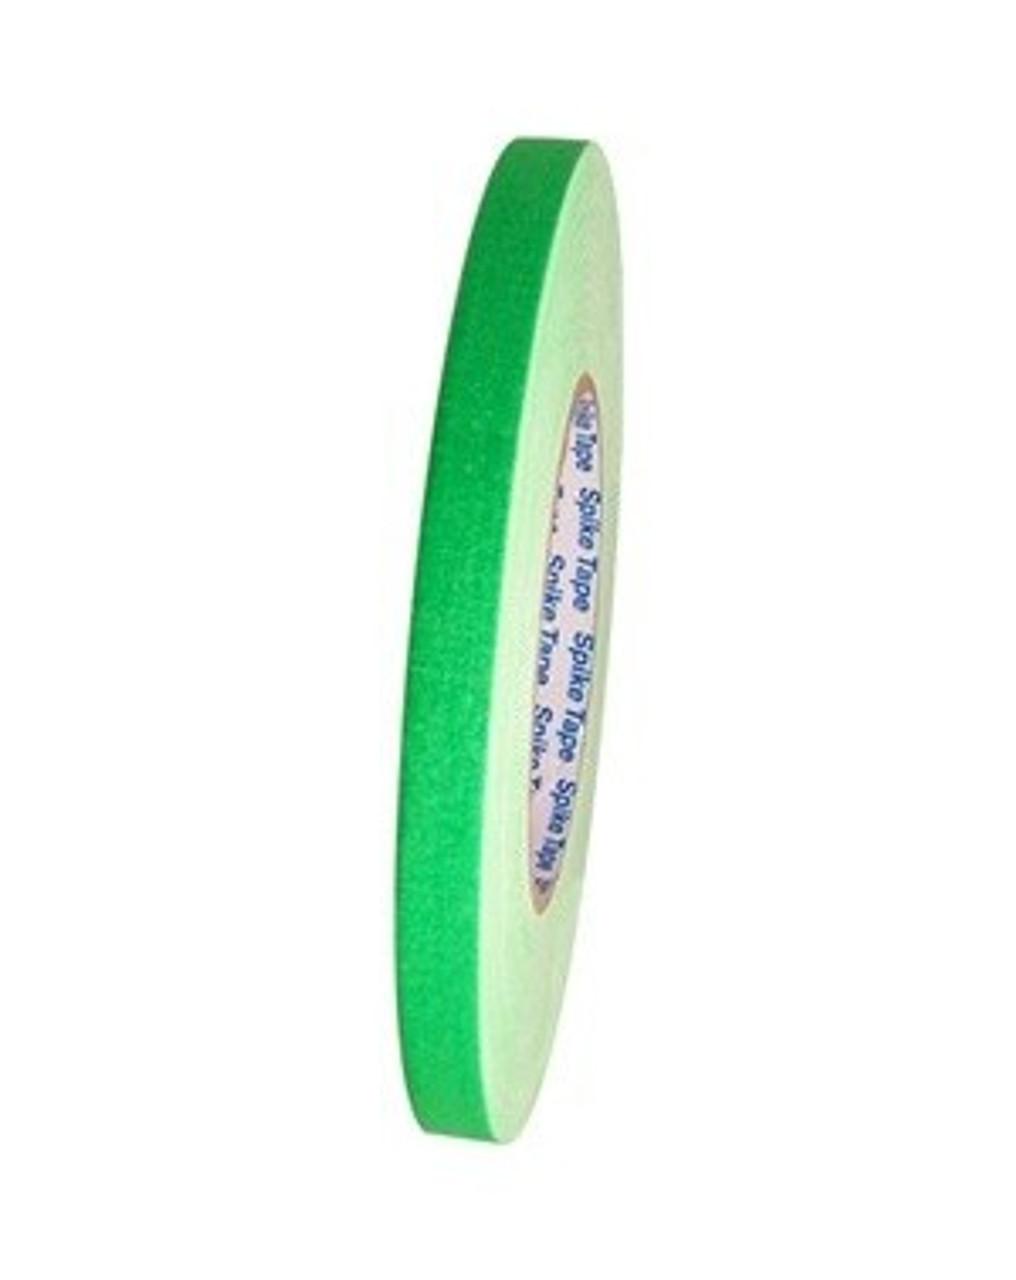 "Spike Tape - FL Green 1/2"" x 50 Yds"